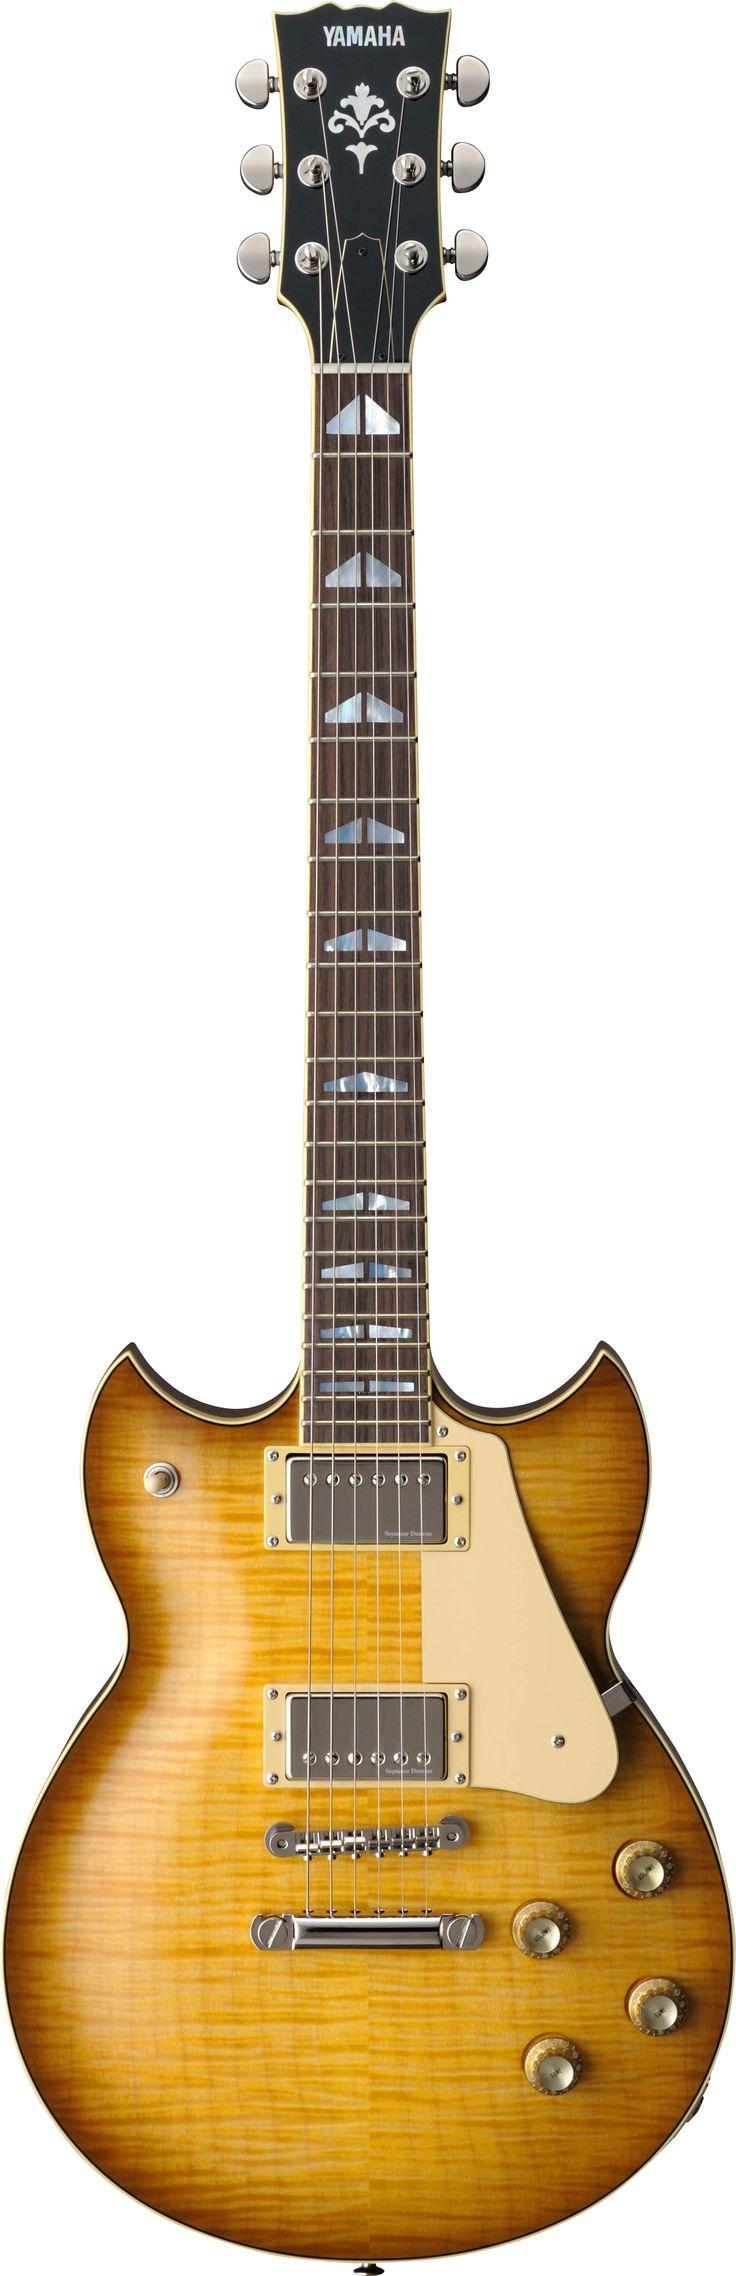 Revstar Yellow Vintage Yamaha Solid Body Electric Guitars